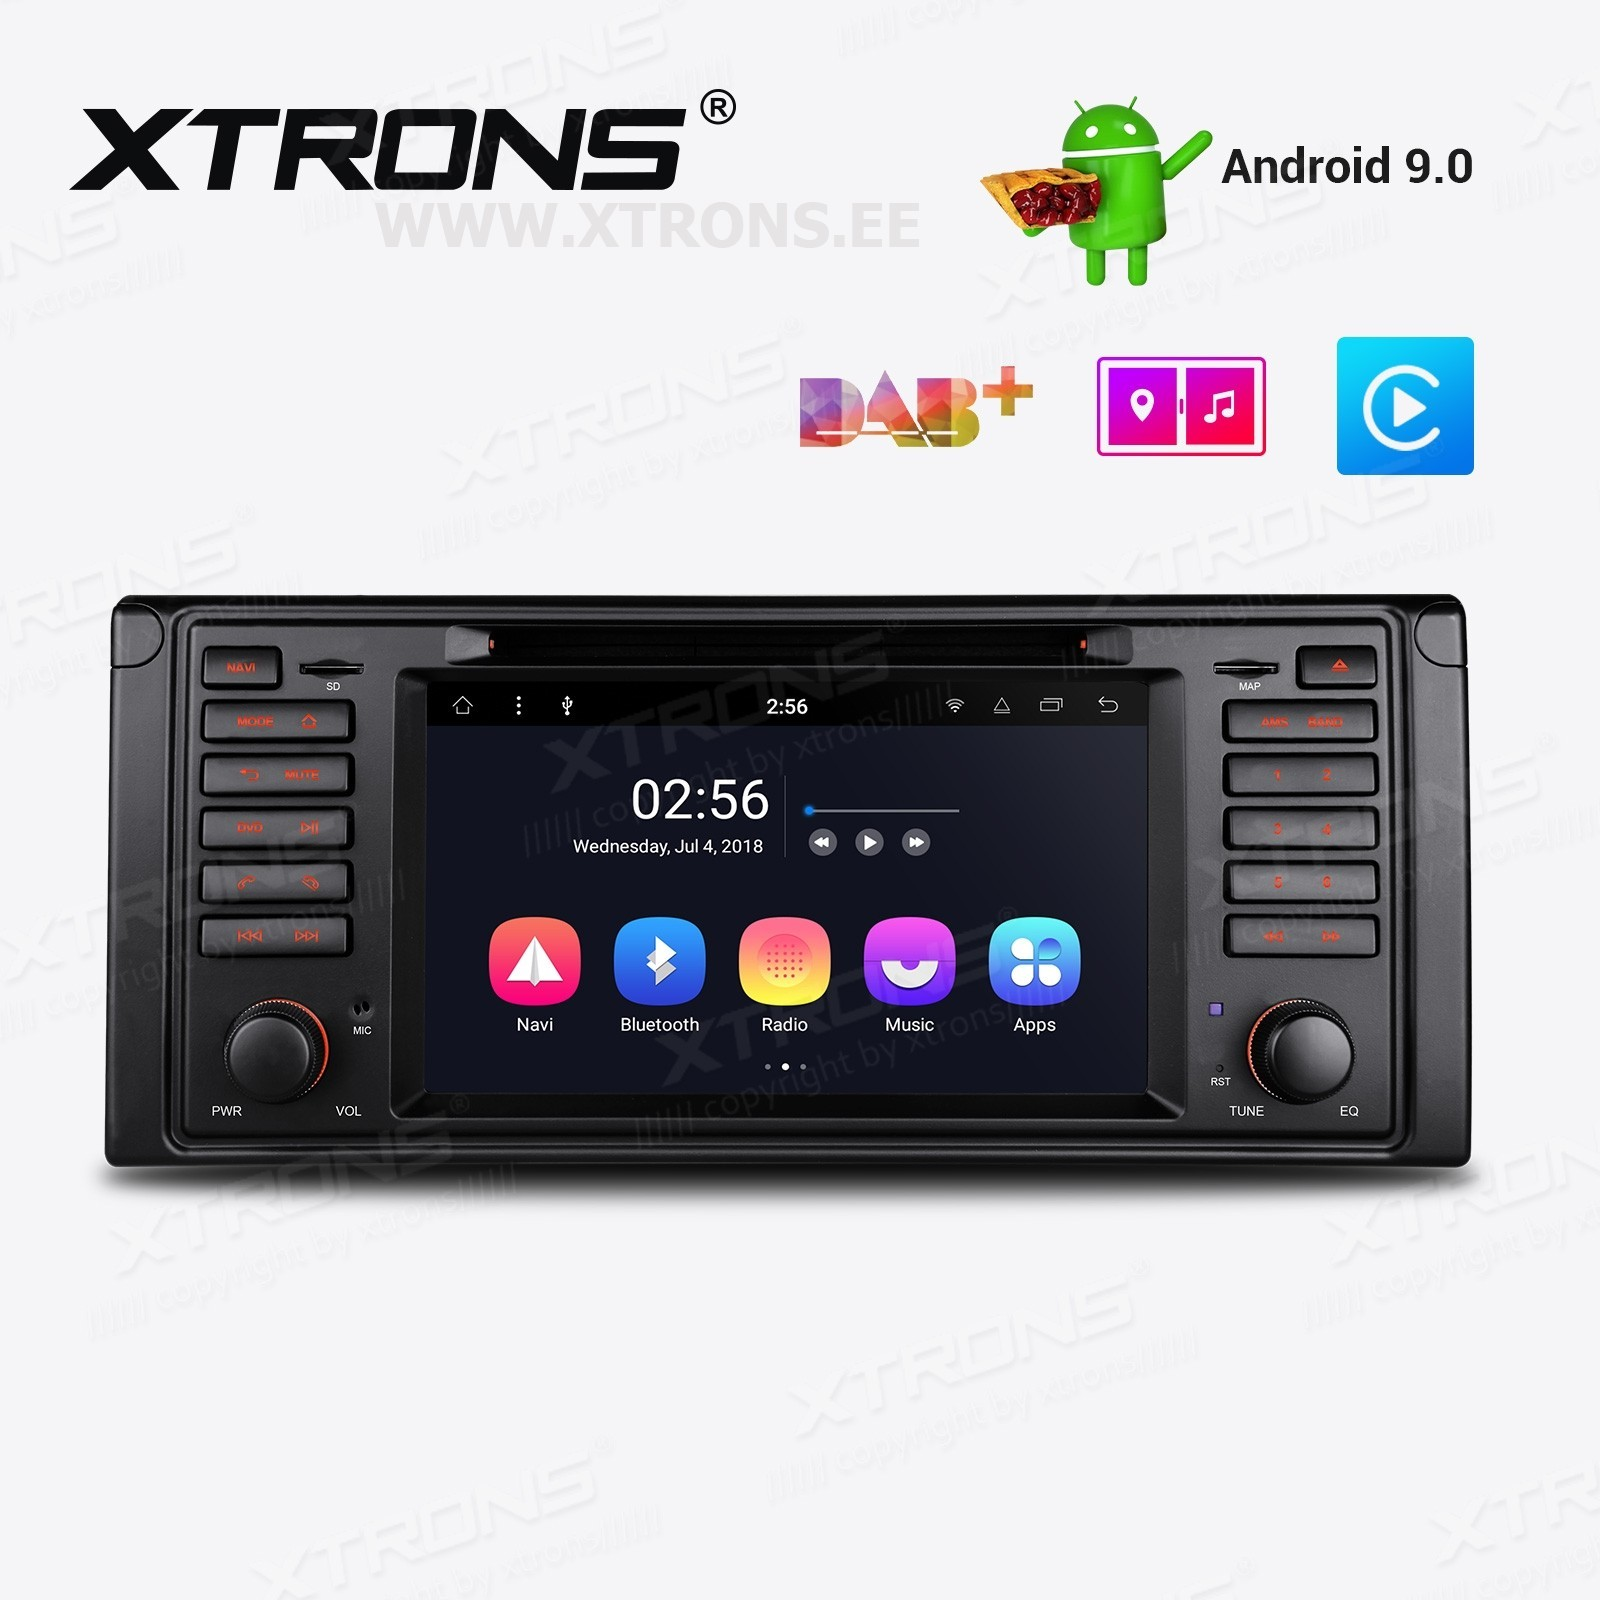 XTRONS PR7939B